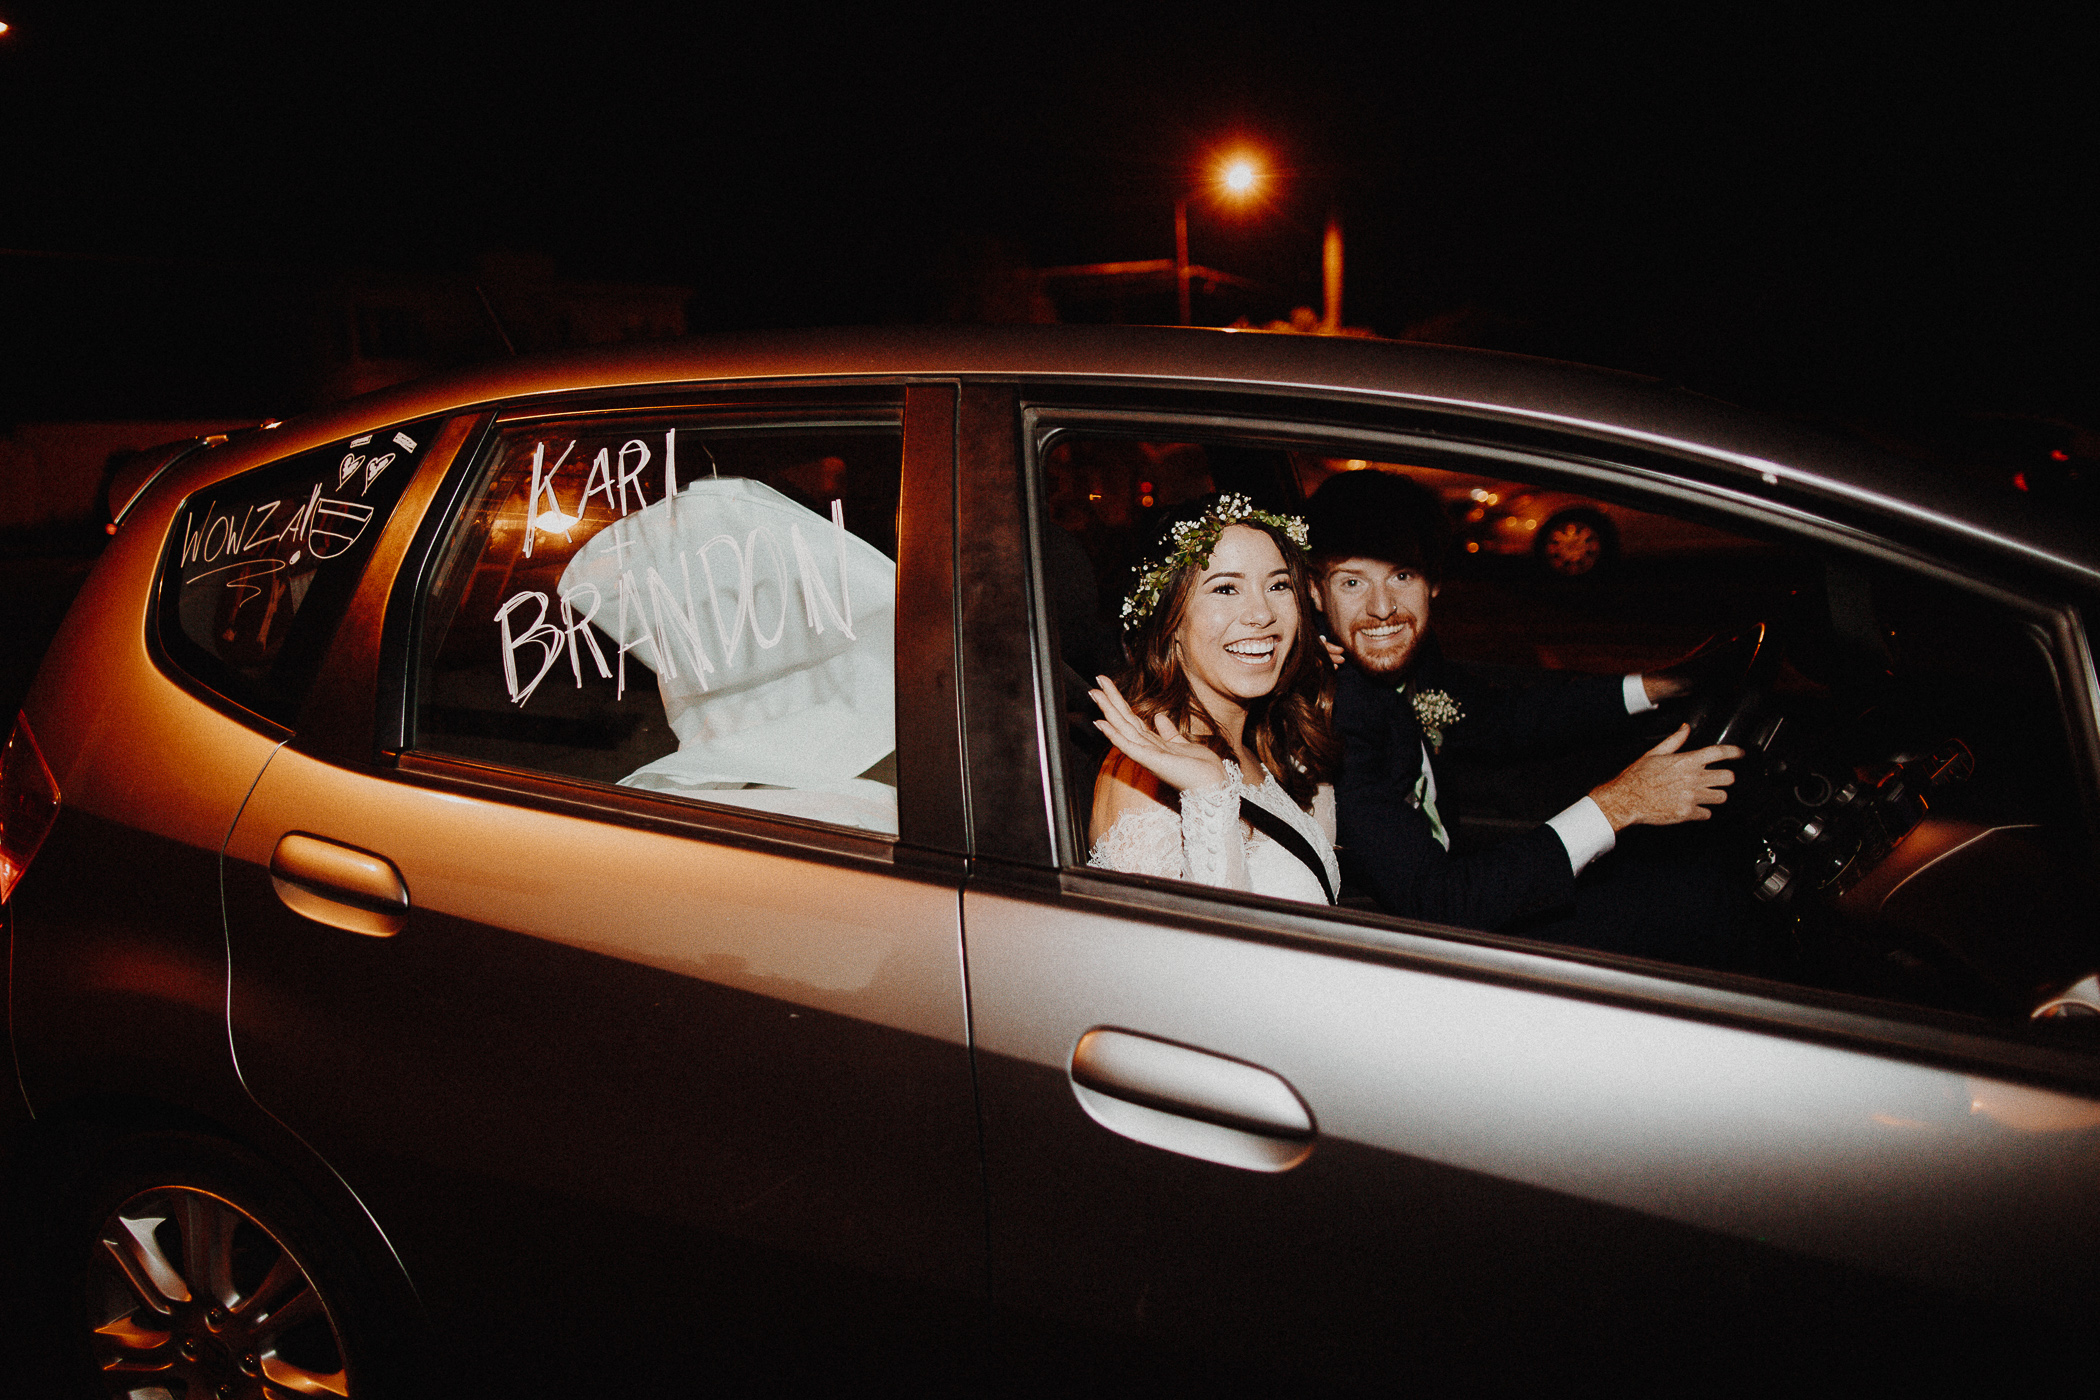 181104-Luxium-Weddings-Arizona-@matt__Le-Brandon-Kariana-Phoenix-Valley-Garden-Center-1156.jpg